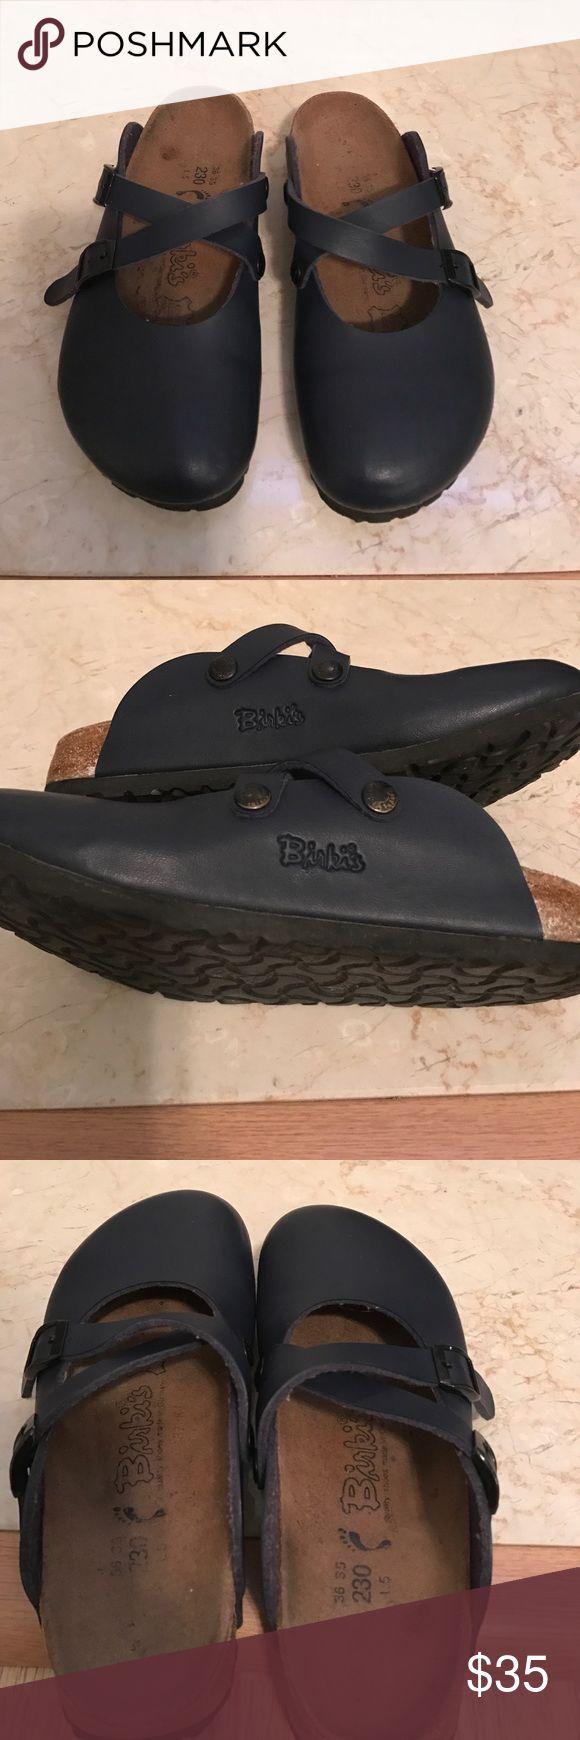 Navy Blue Birkis Birkenstock Mules Clogs size 5 Birki's navy slip on shoes. Two buckles. Open back European size 36 35 US size 5 Birkenstock Shoes Mules & Clogs